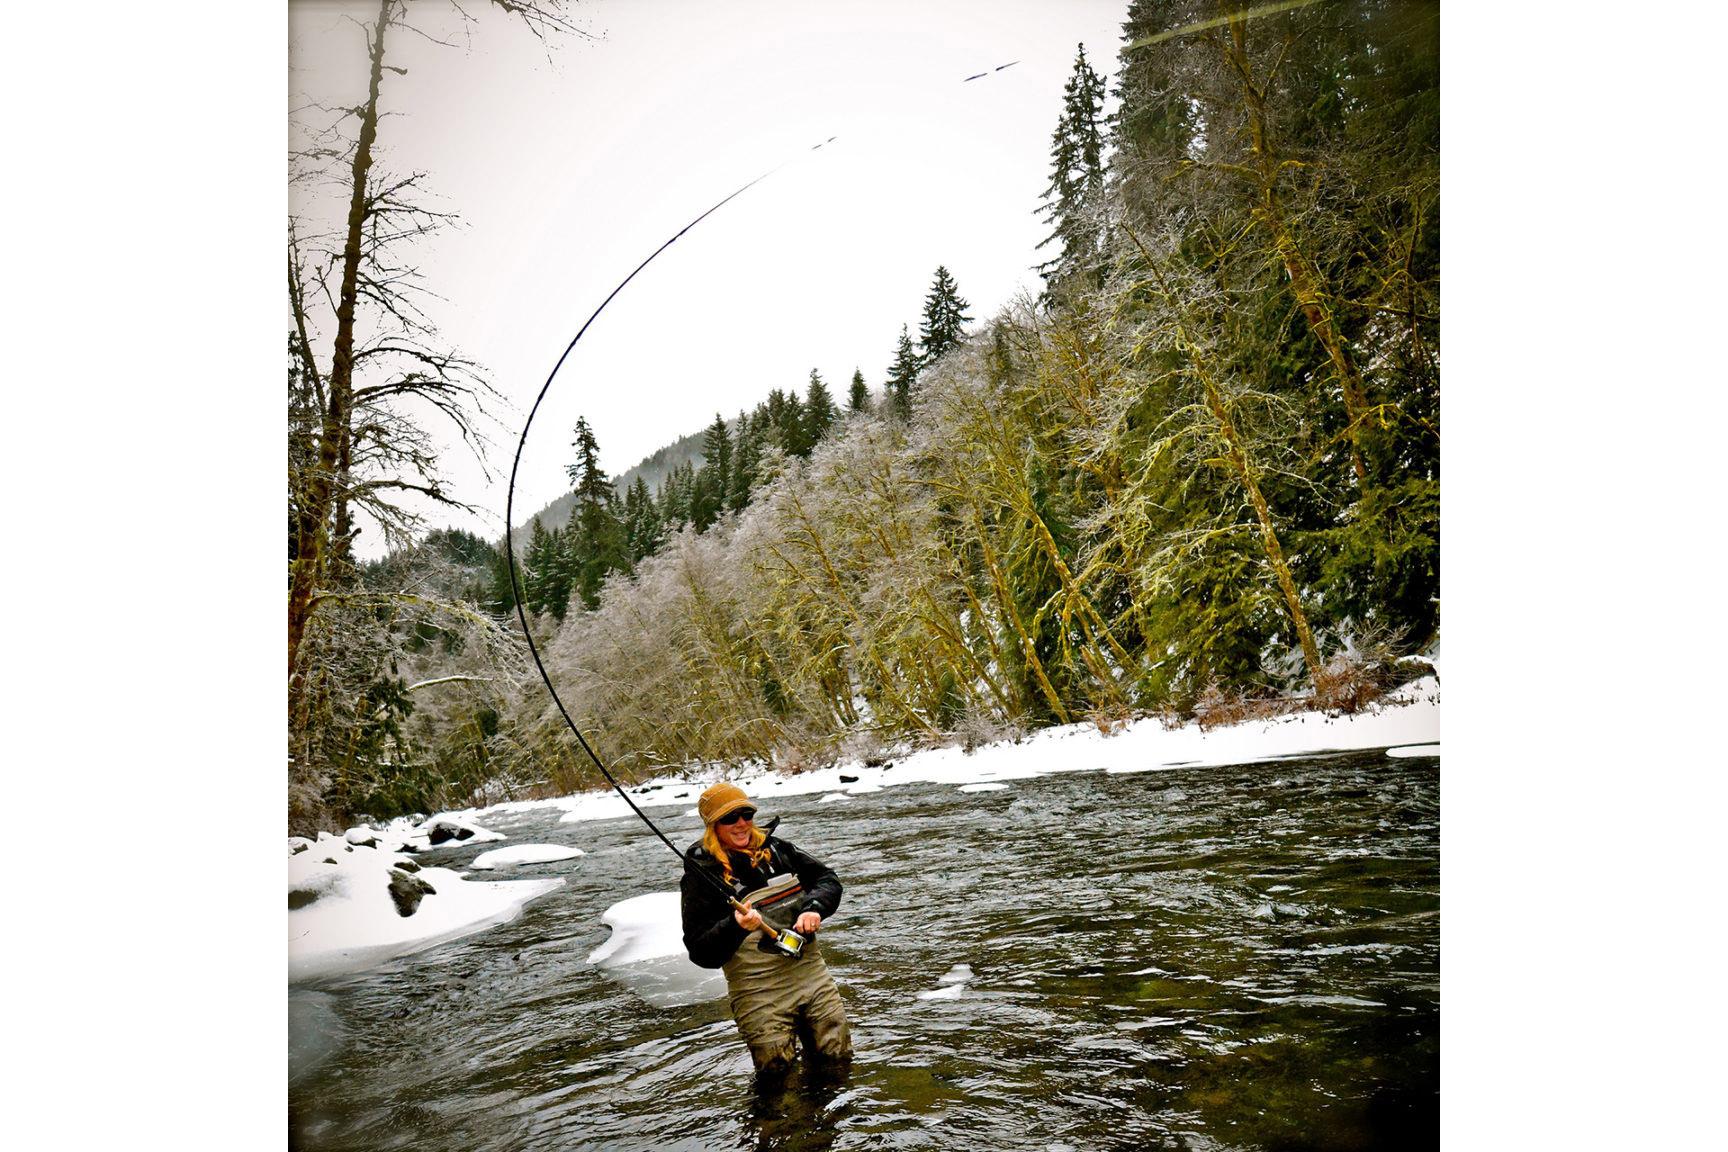 Sandy river winter steelhead fishing trip little creek for River fishing tips